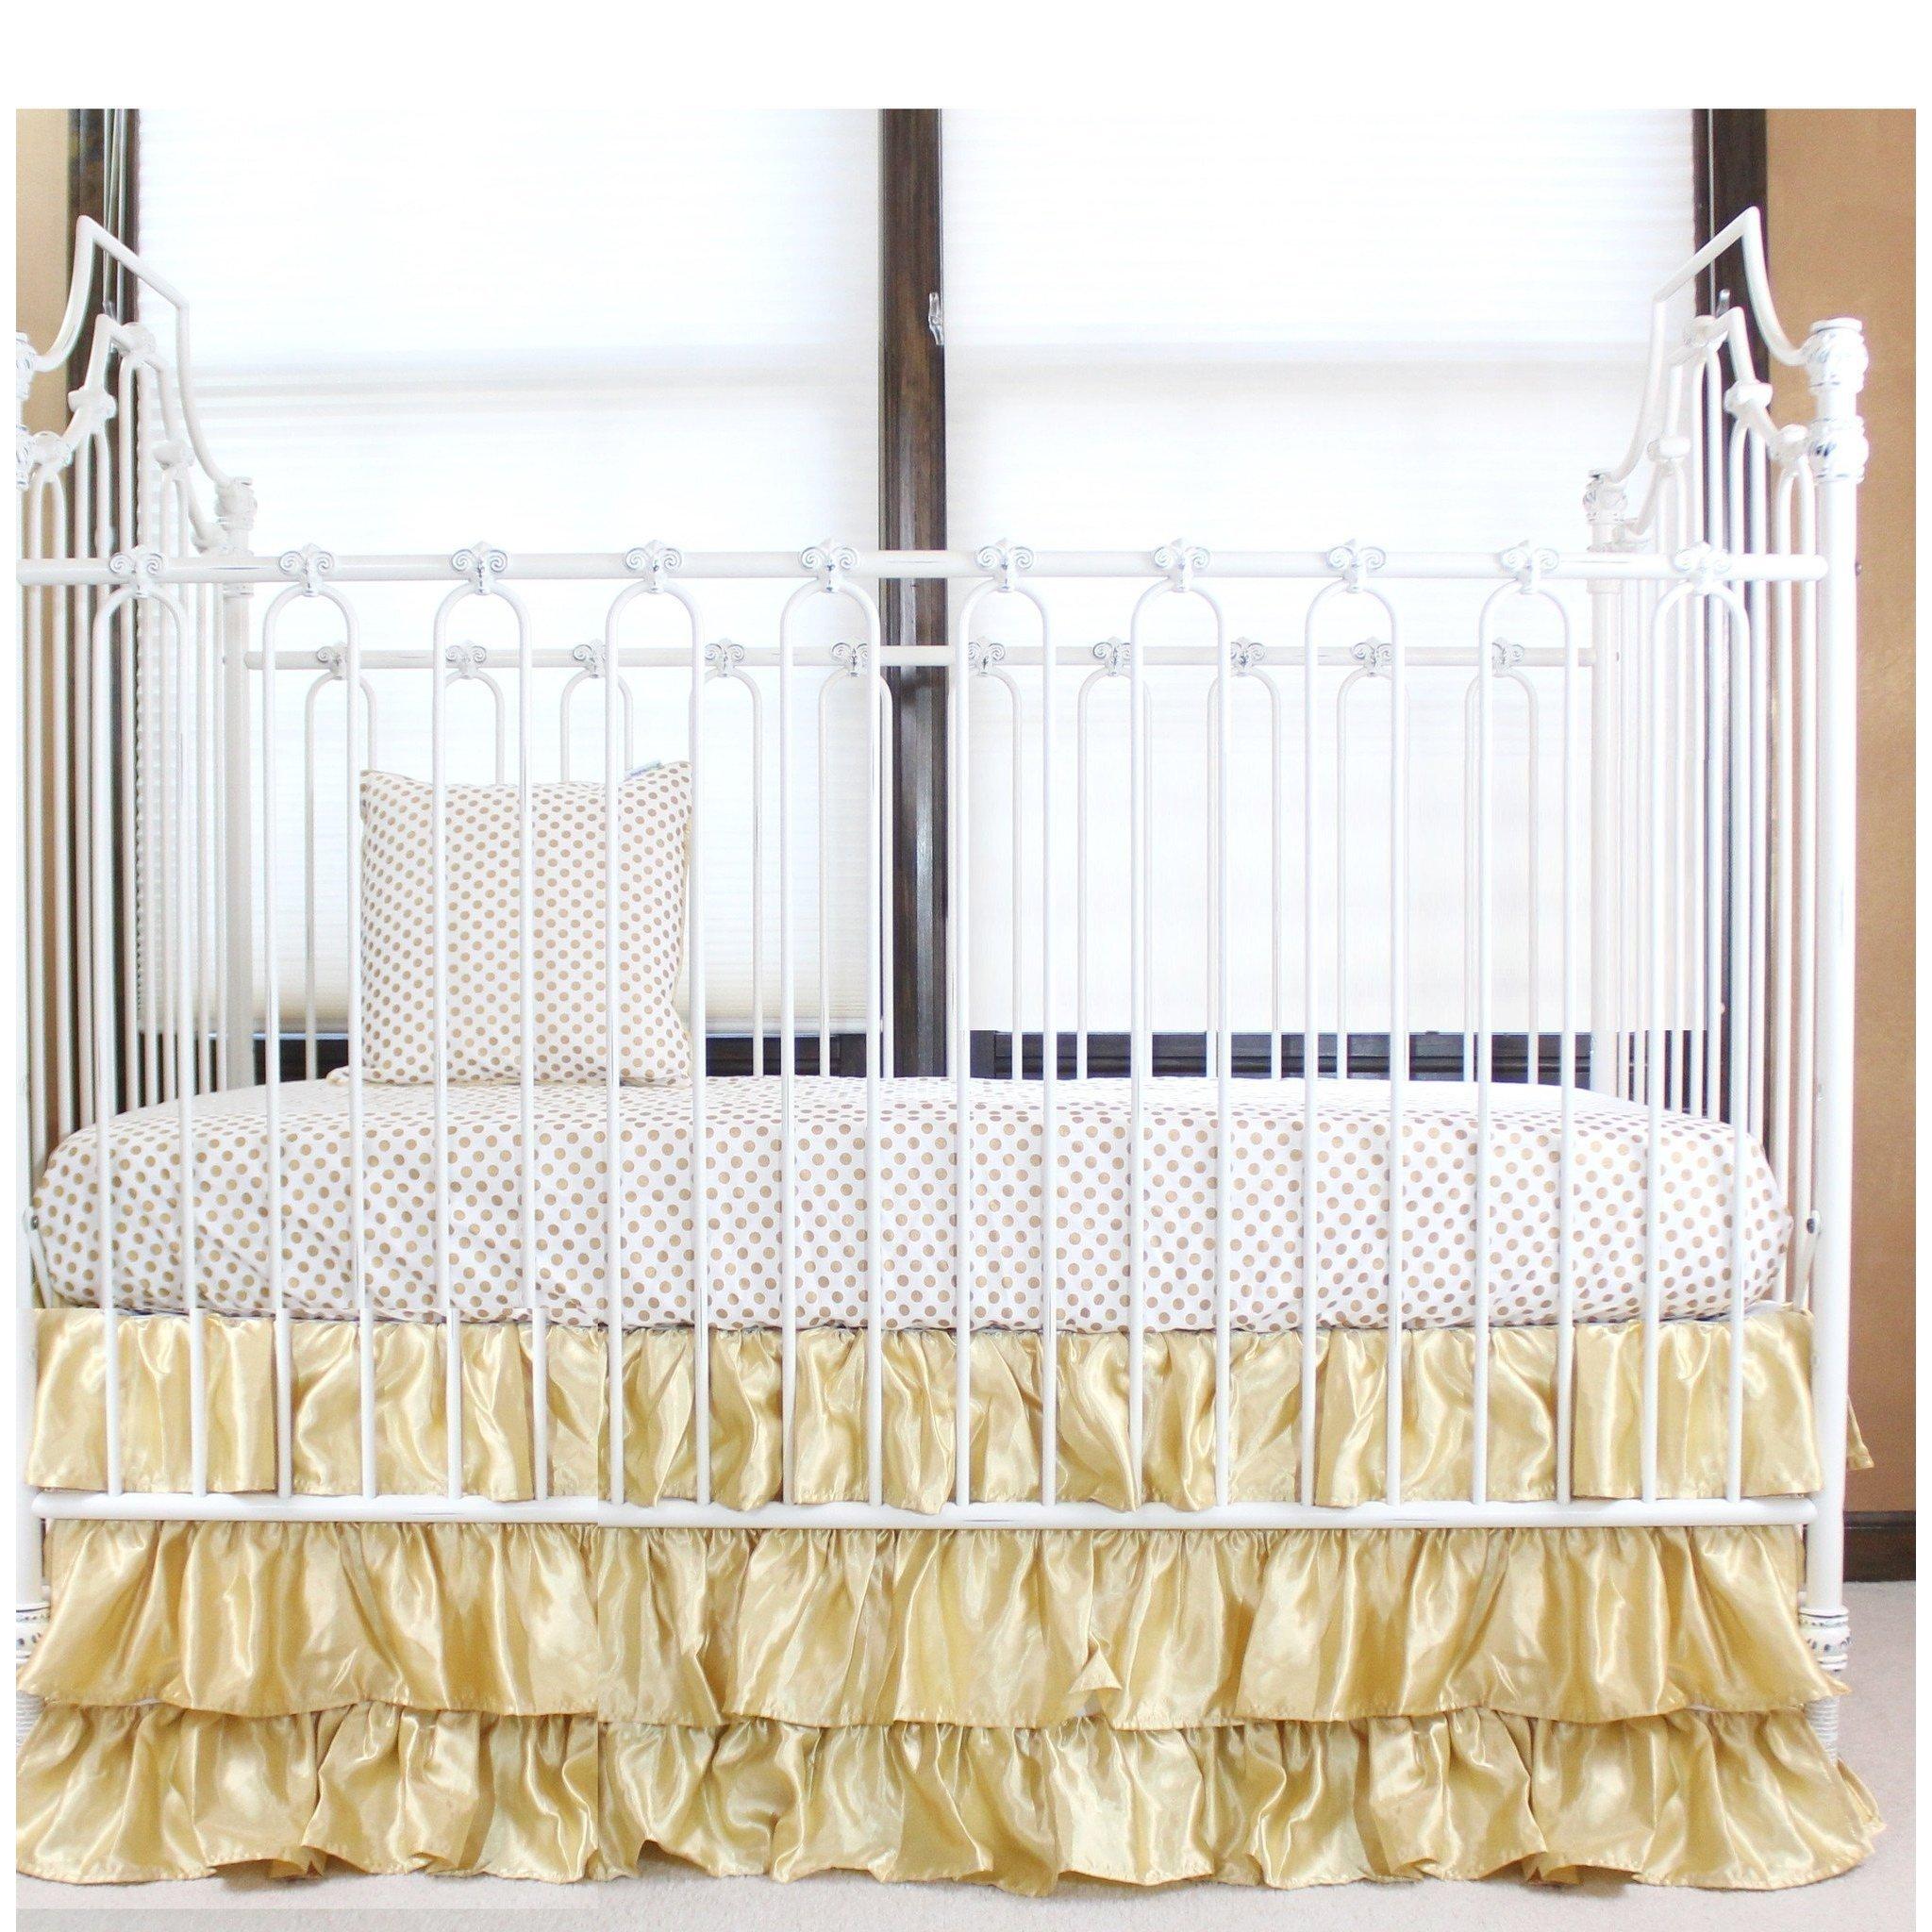 Gold And White Ruffle Gold Dot Crib Baby Bedding Set Crib Bedding Set Bold Bedding Jack And Jill Bouti Baby Bedding Sets Crib Bedding Girl Gold Nursery Decor